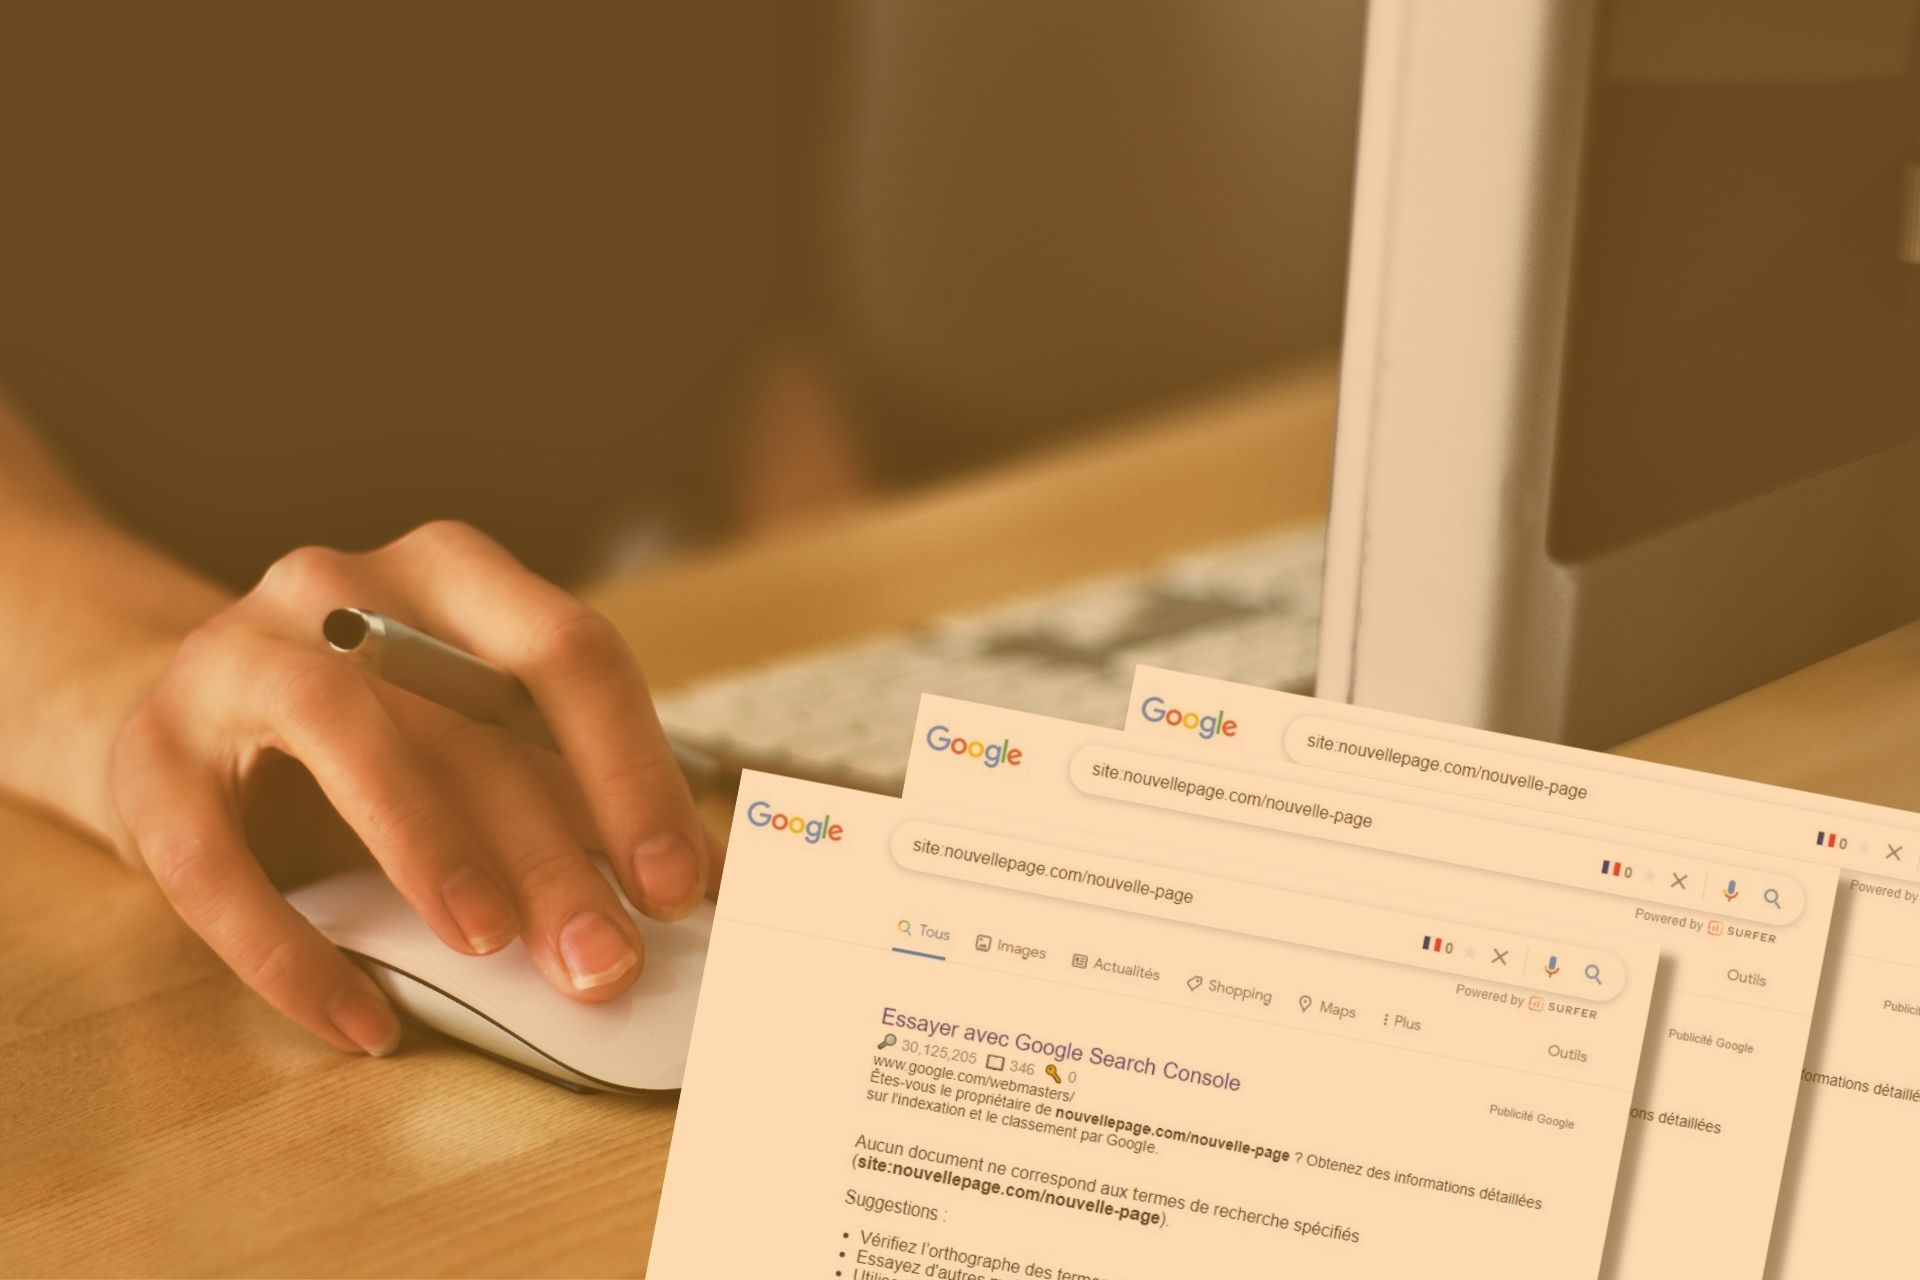 indexer nouvelle page rapidement google